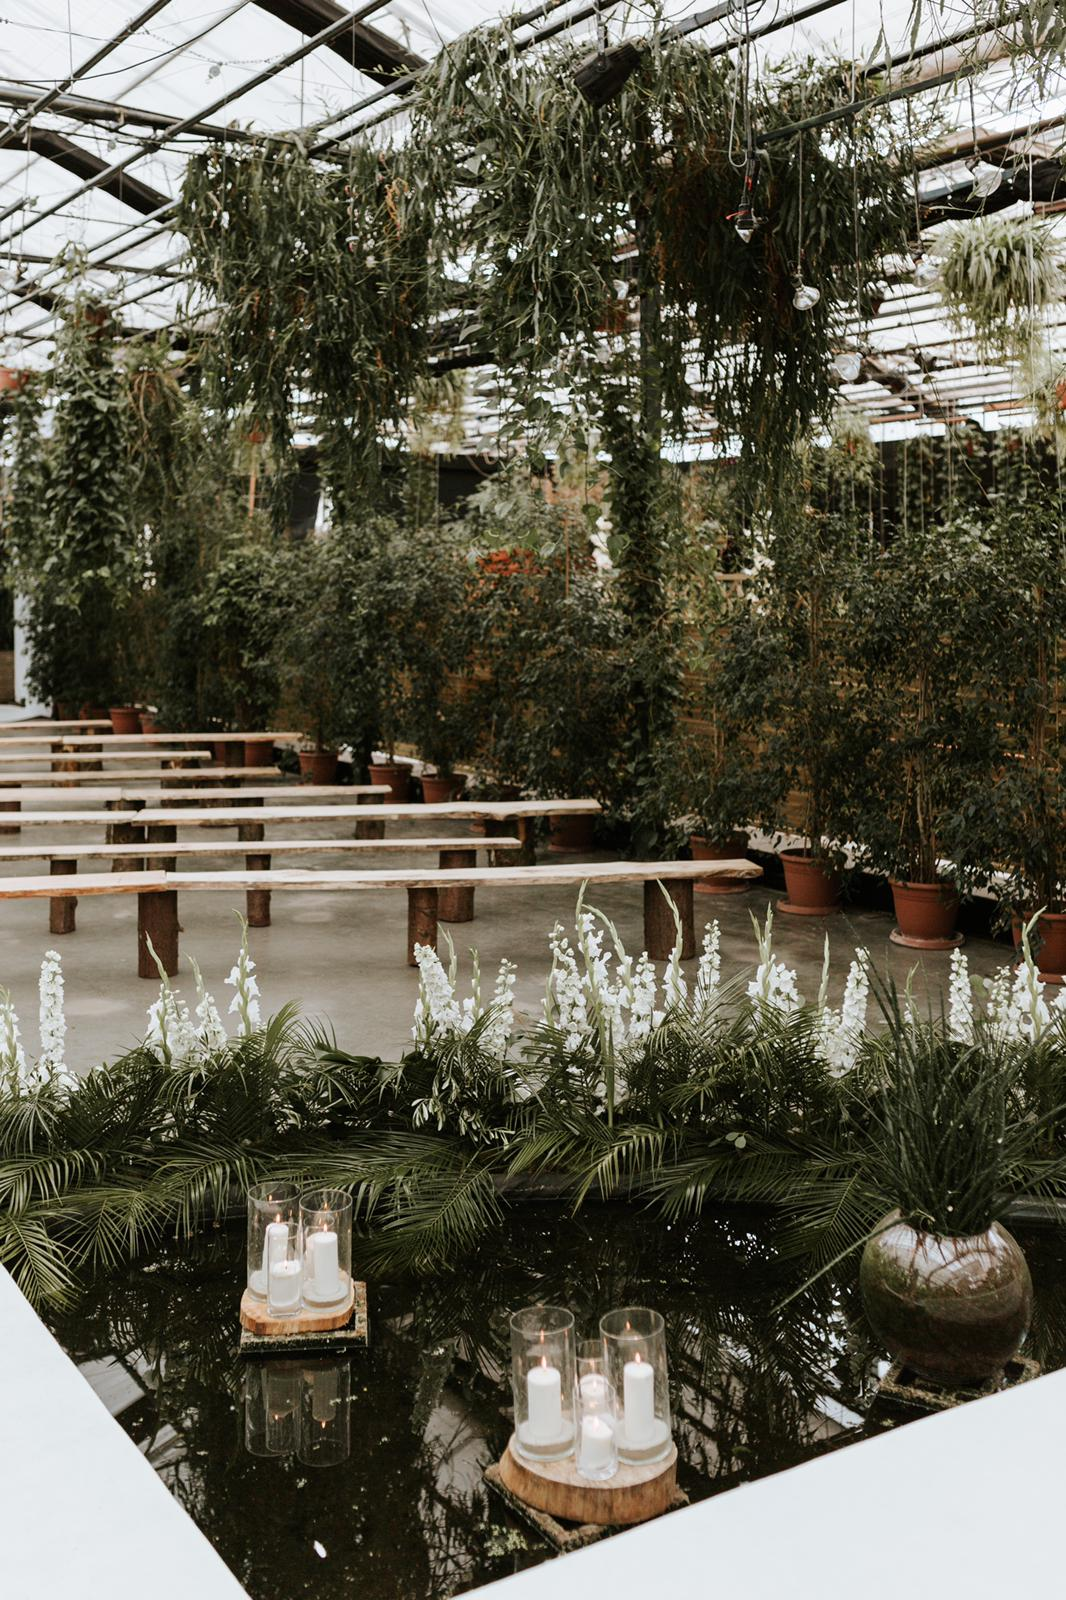 #apbloem #florist #bloemist #amsterdam #bloemenwinkel #kerkstraat #bloemen #flowers #weddingstyling #bruiloft #trouwen #liefde #bride #wedding #marriage #bruidsboeket #floraldesign #mordernwedding #modernbride #greenhouse #kas #planten #styling #interiorstyling #plants